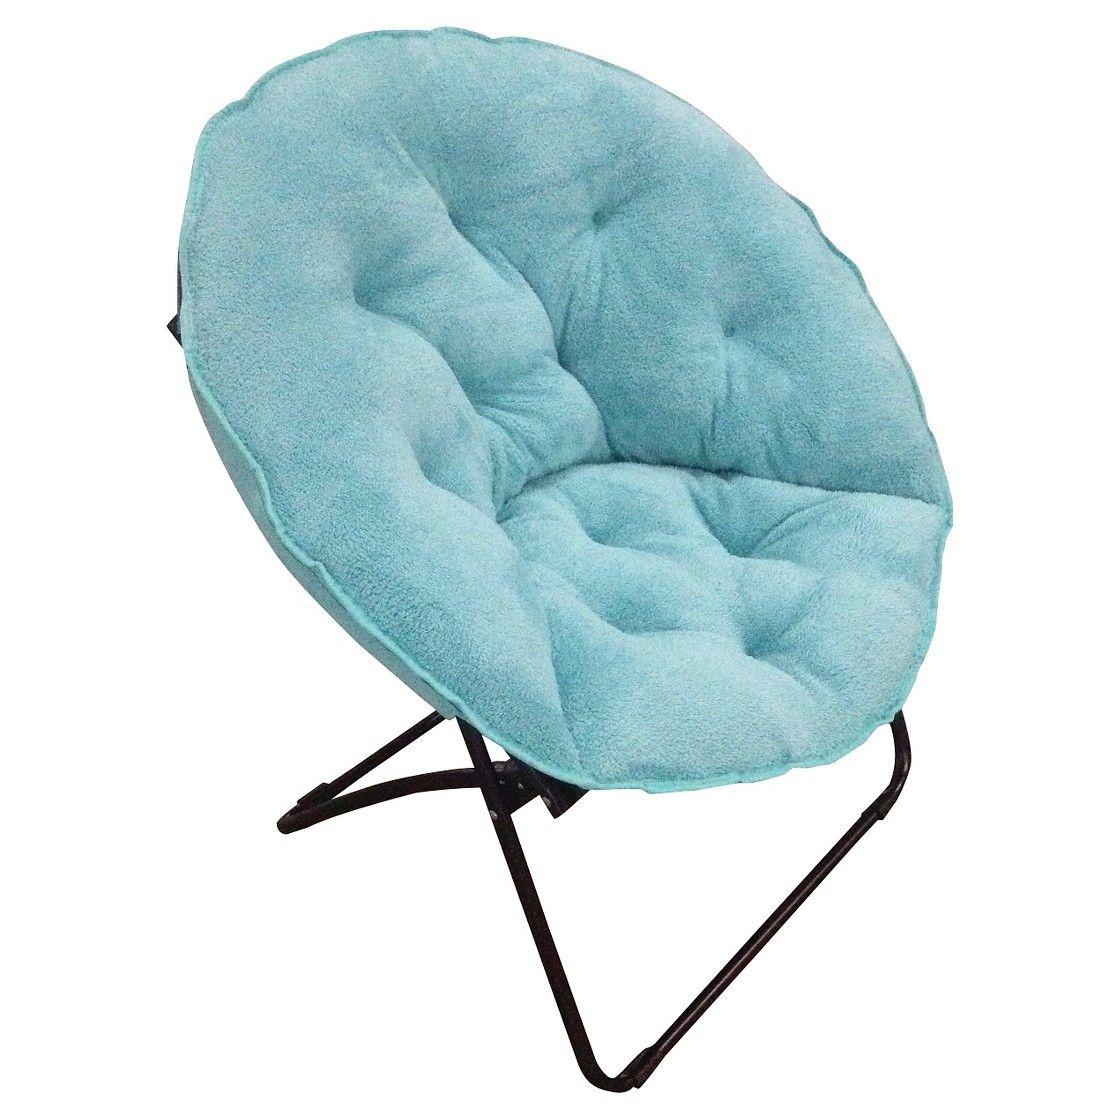 Room Essentials Fuzzy Dish Chair Aisle D16 Blue Or Grey